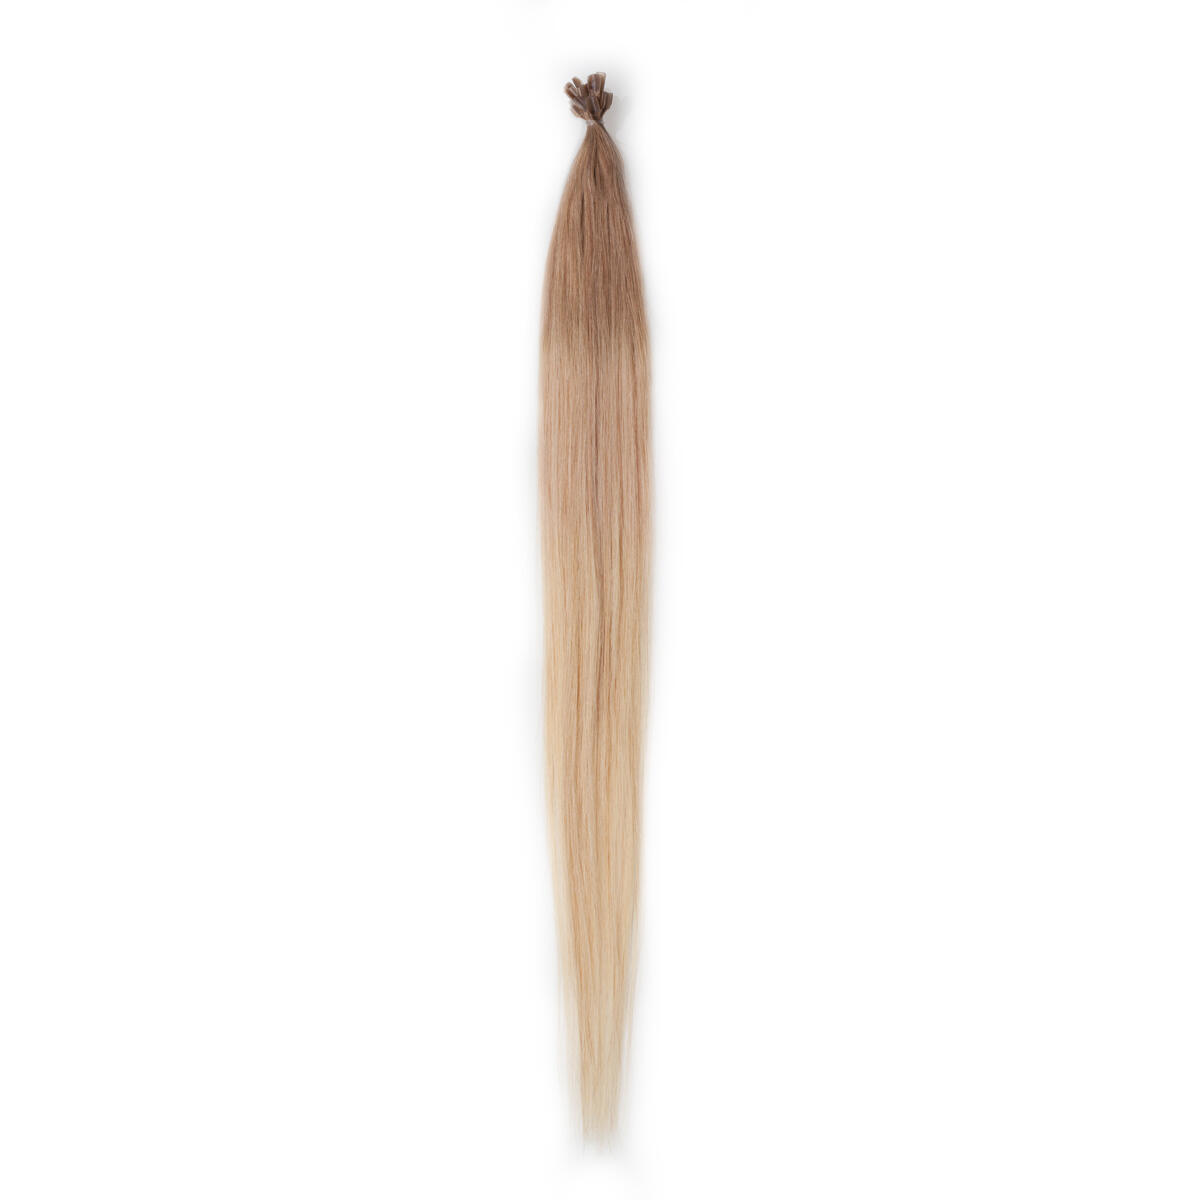 Nail Hair Original O7.5/8.3 Golden Blond Ombre 40 cm